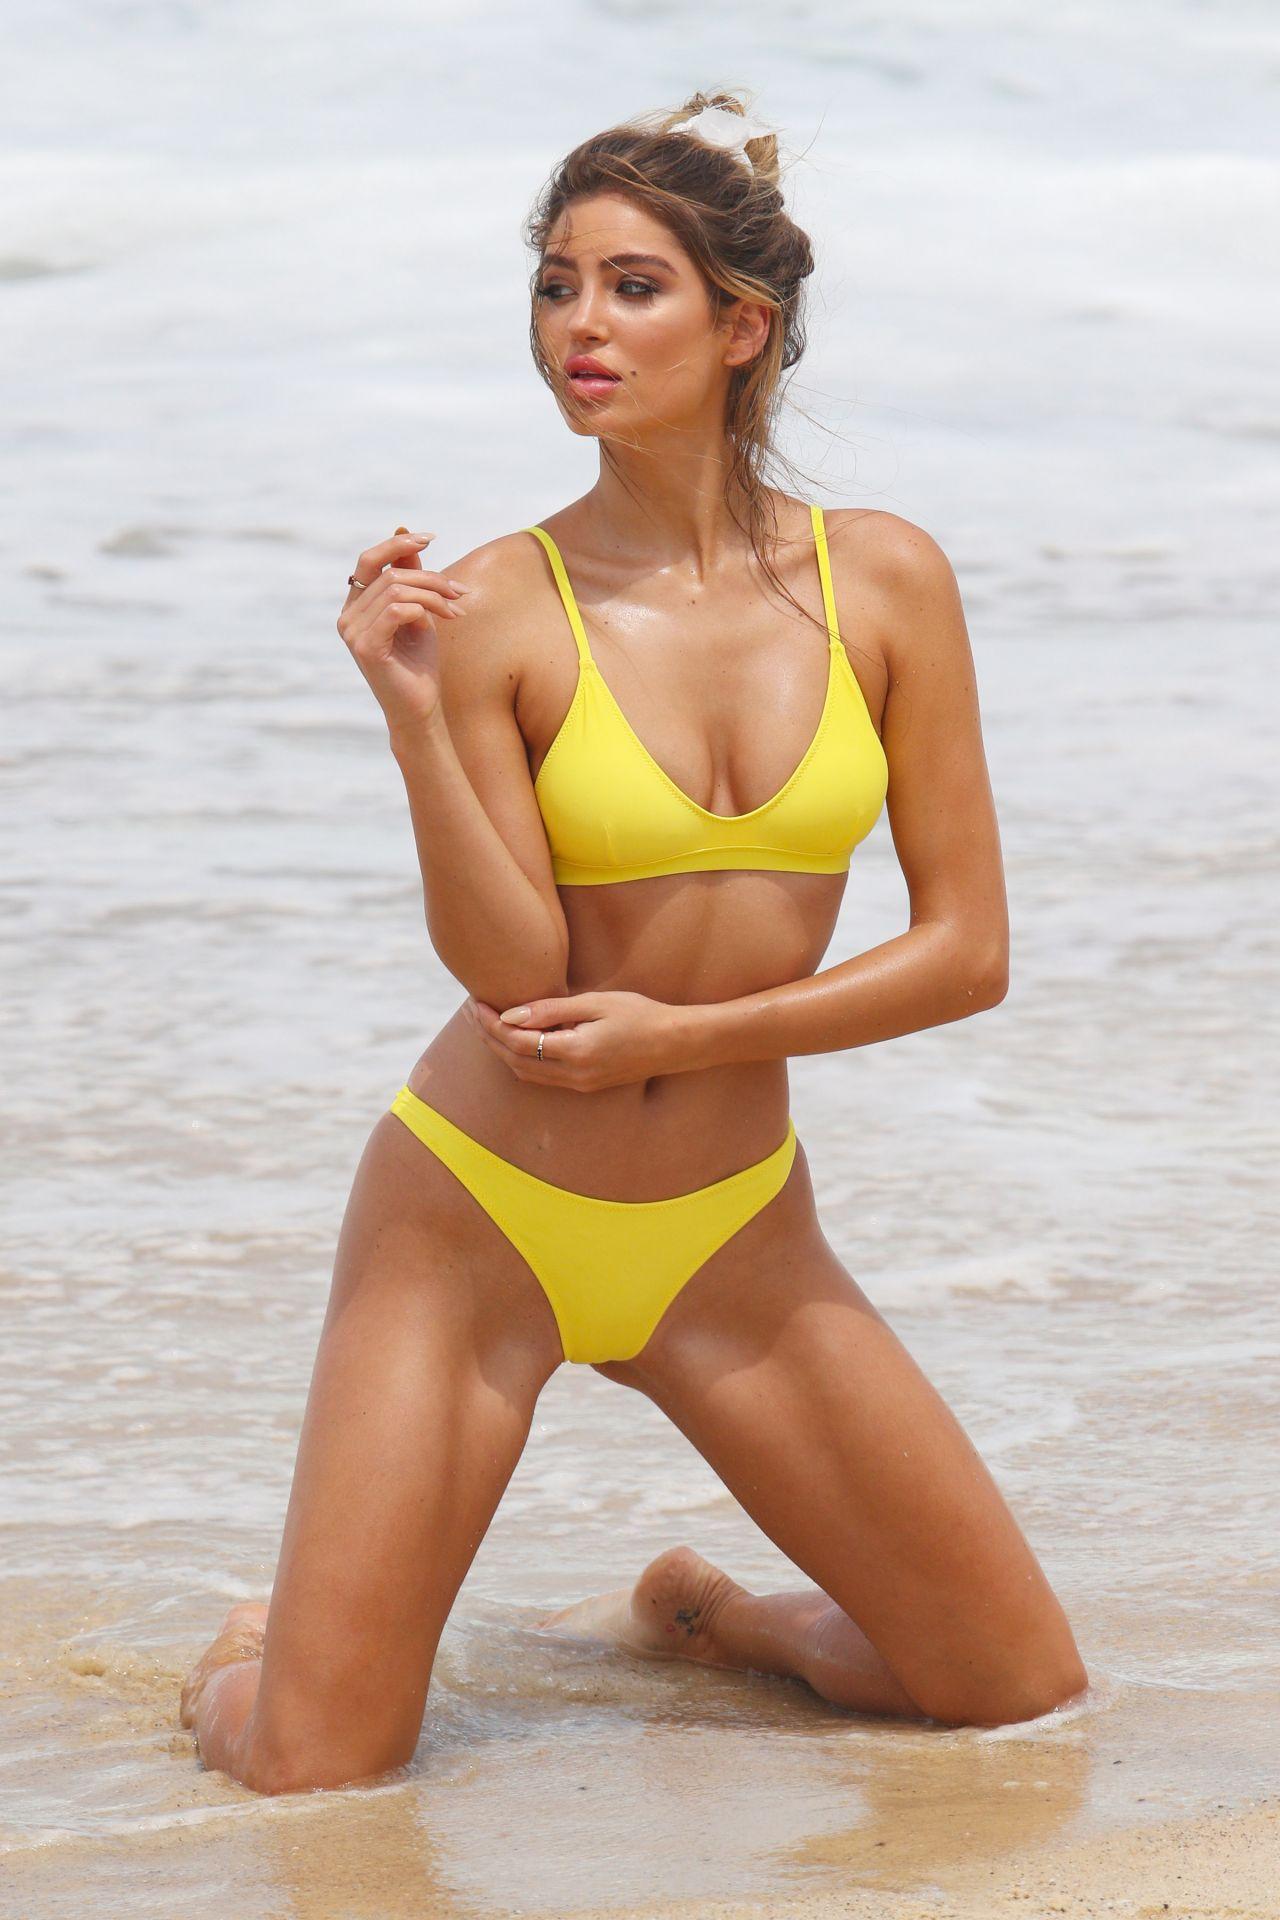 Bella Lucia Bikini Photoshoot on Bronte Beach Pic 17 of 35